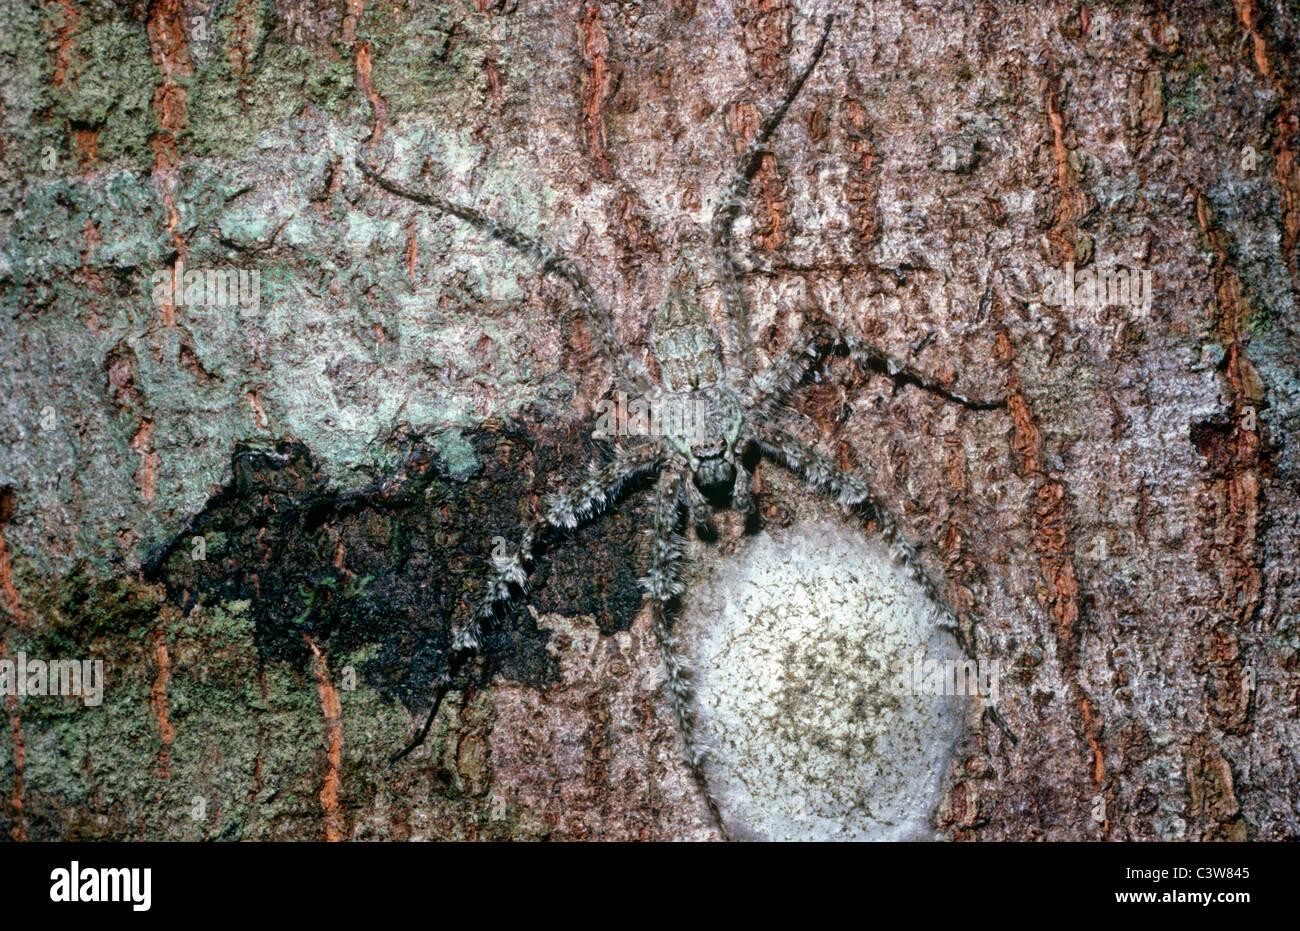 Lichen huntsman spider female (Pandercetes gracilis) camouflaged and guarding her egg-sac, rainforest, Queensland, Stock Photo